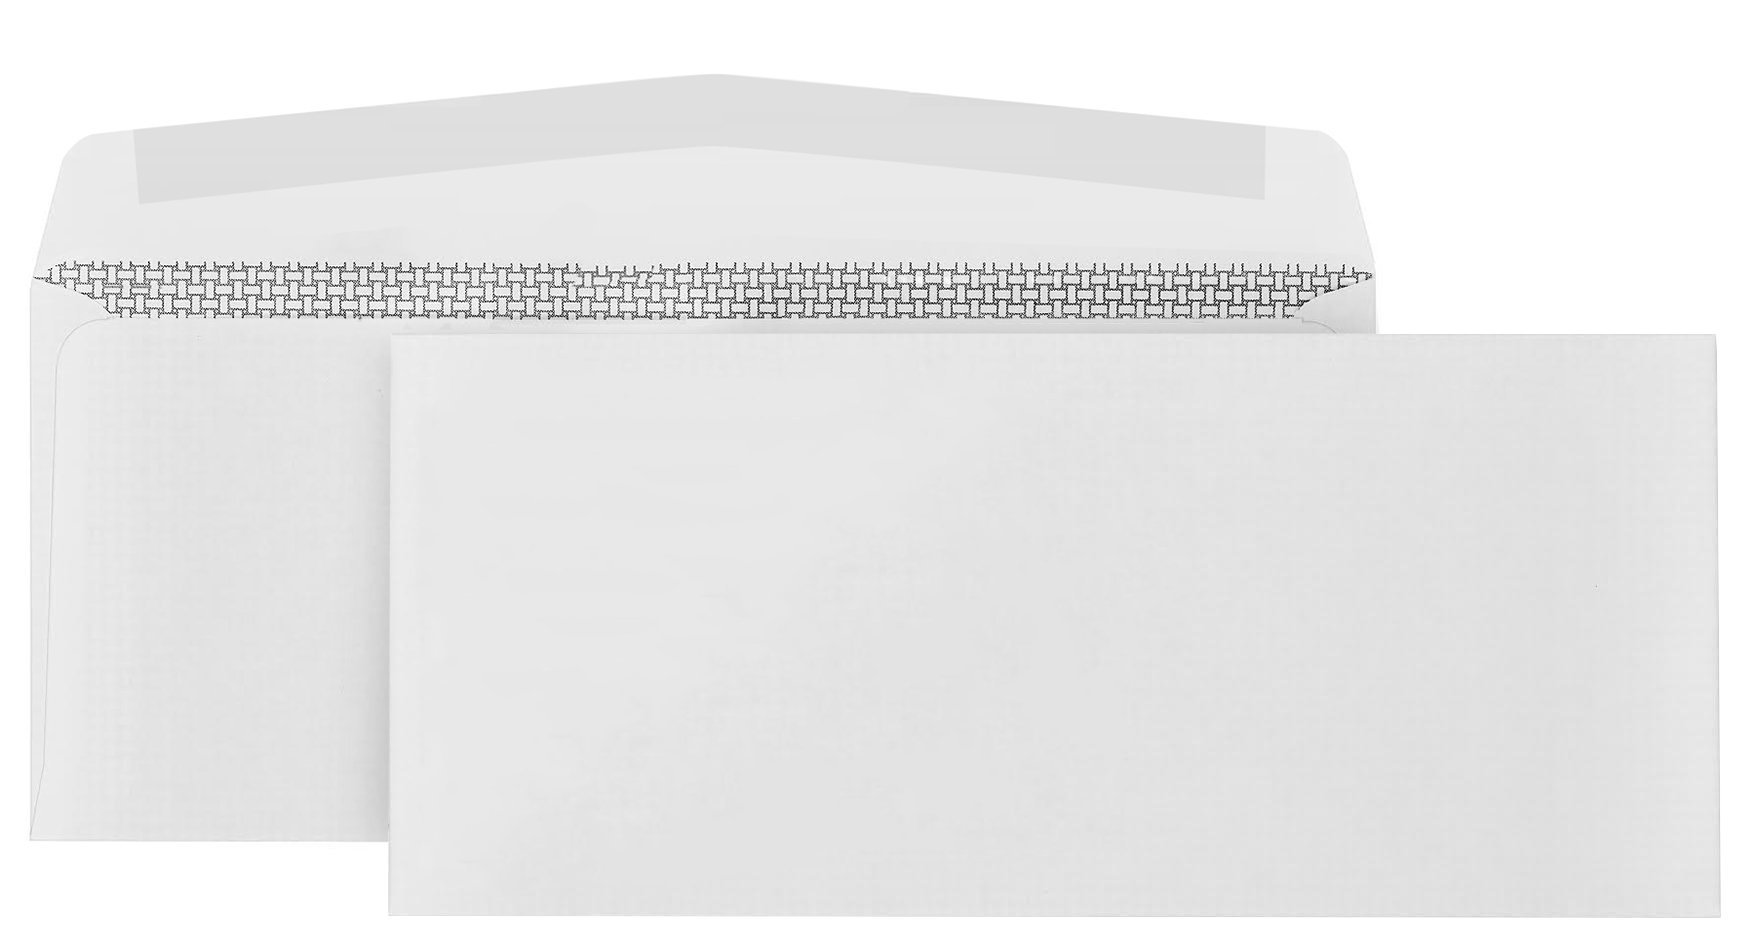 500 #10 Security Envelopes-Gummed Flap-Tamper Proof Design-Security tinted with Printer Friendly Design- 4 1/8 x 9 ½''-Pack of 500